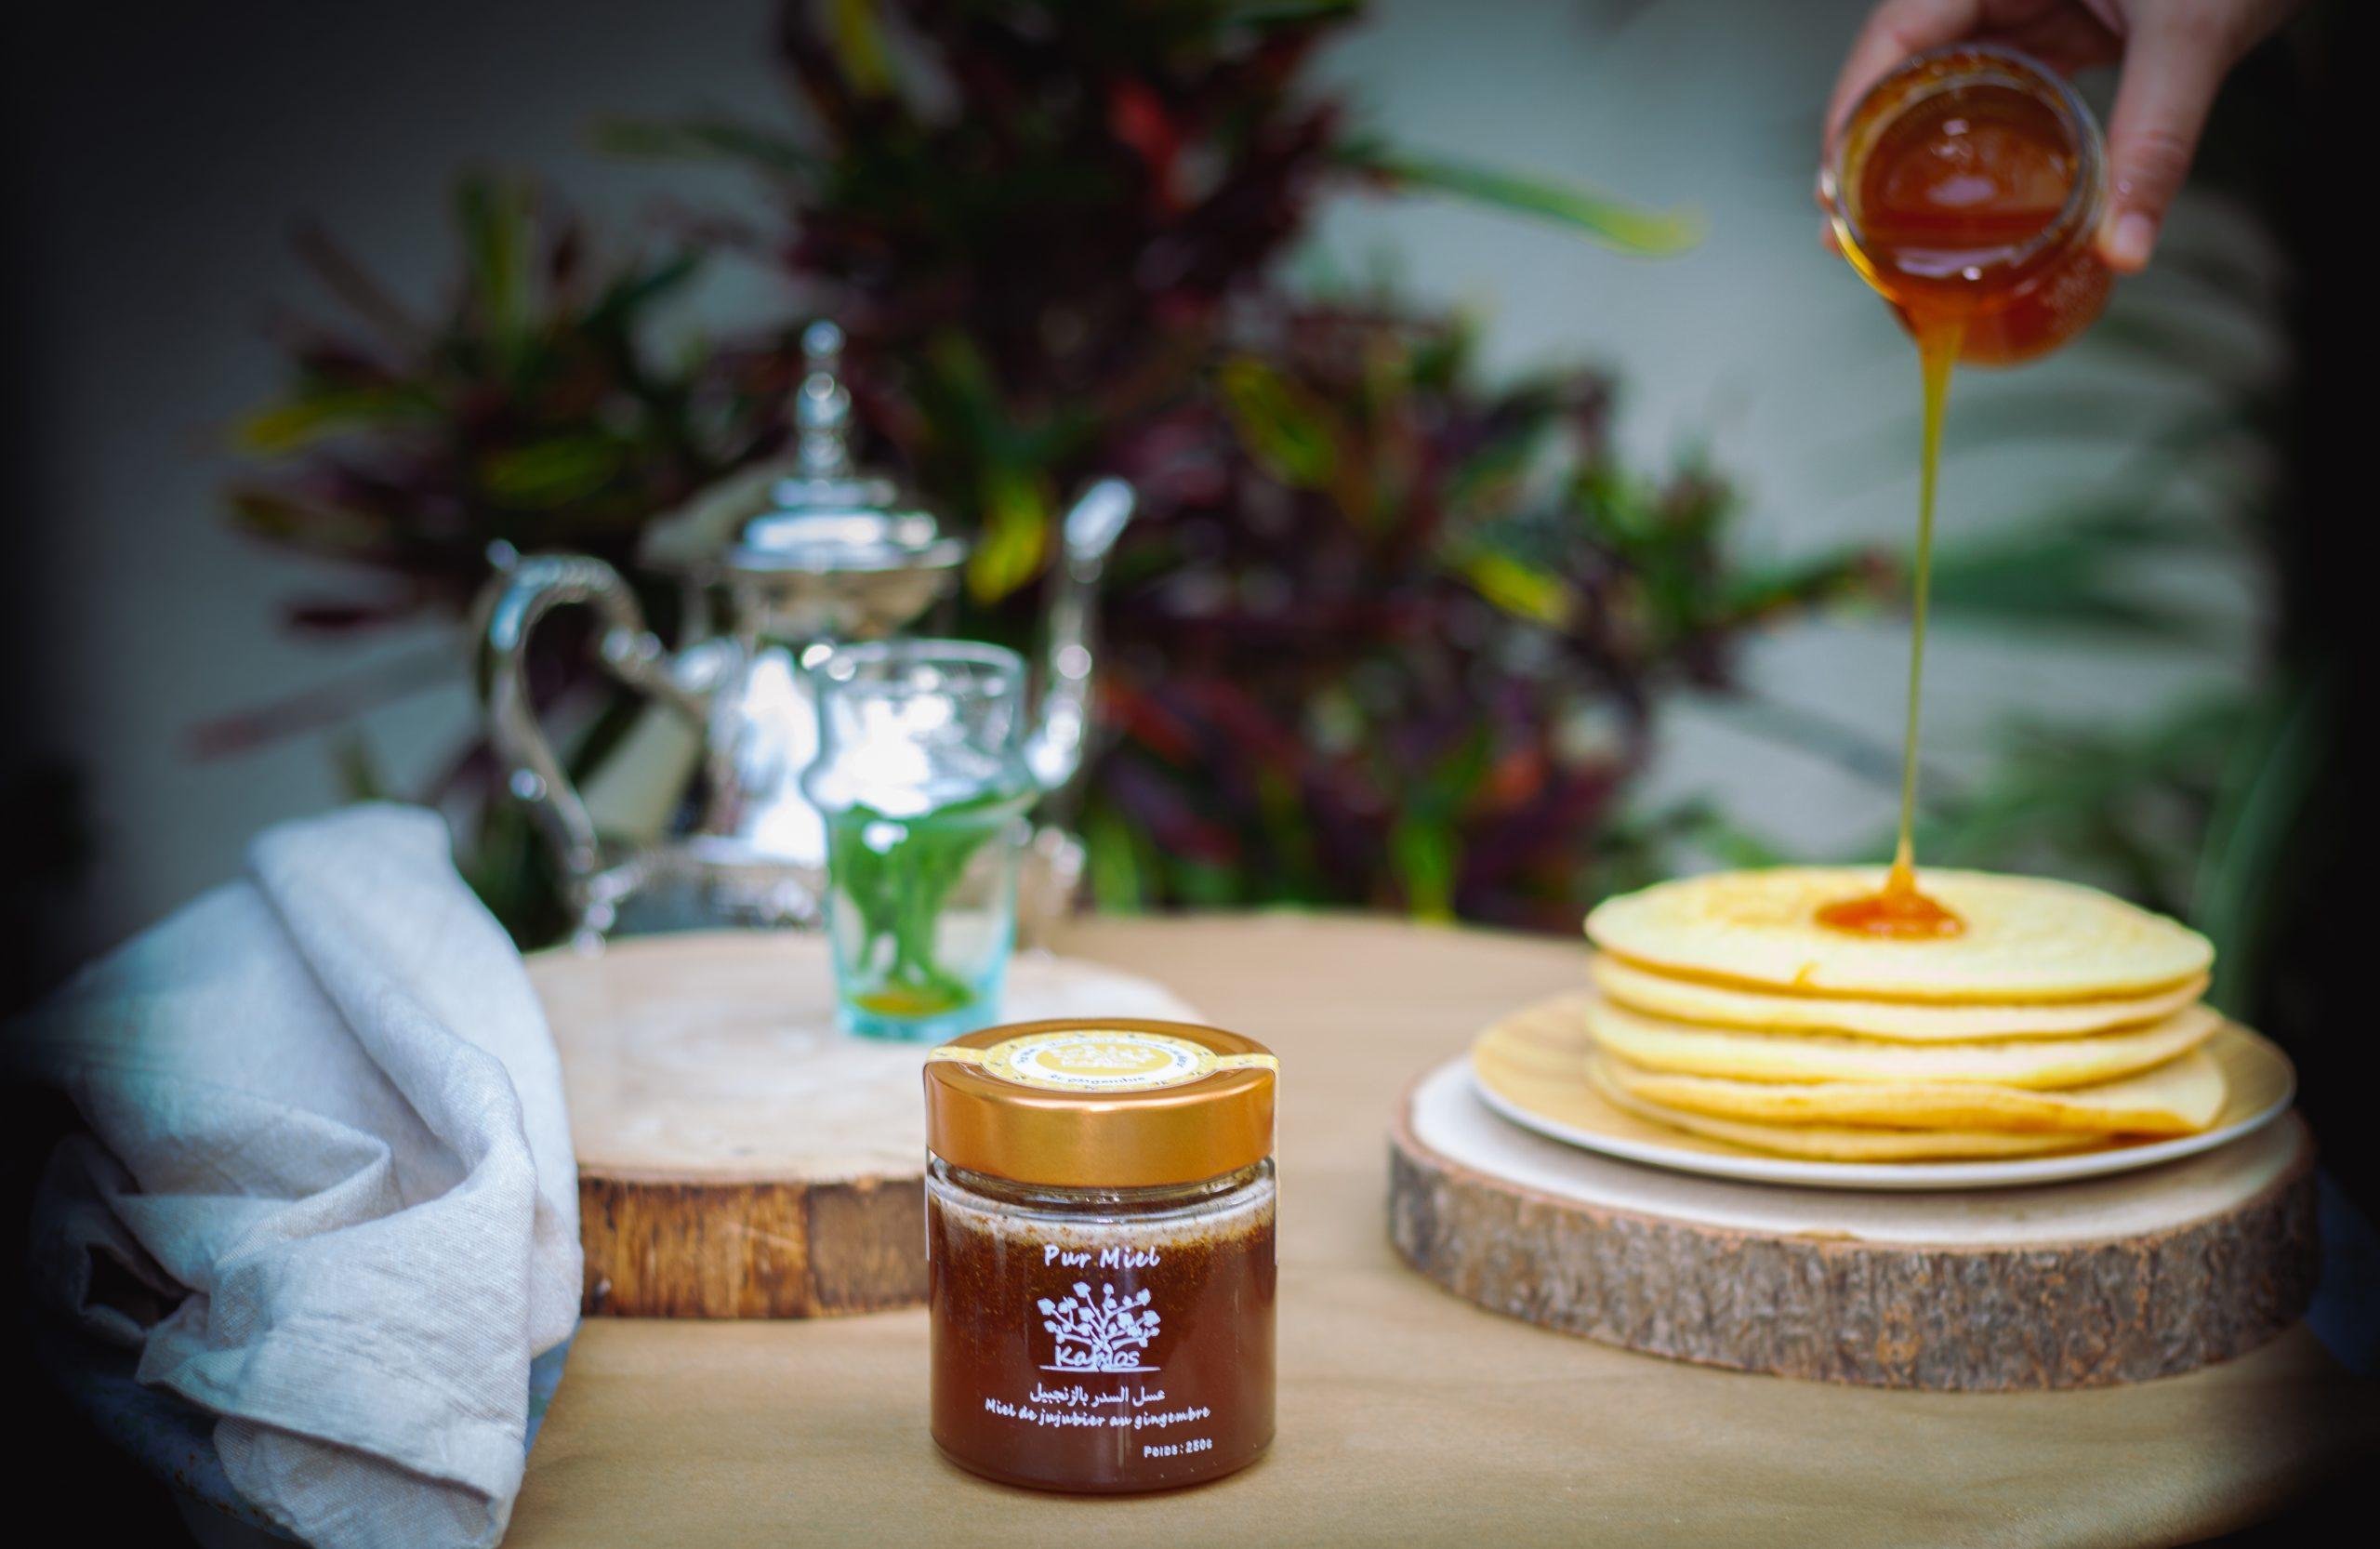 Purs miels